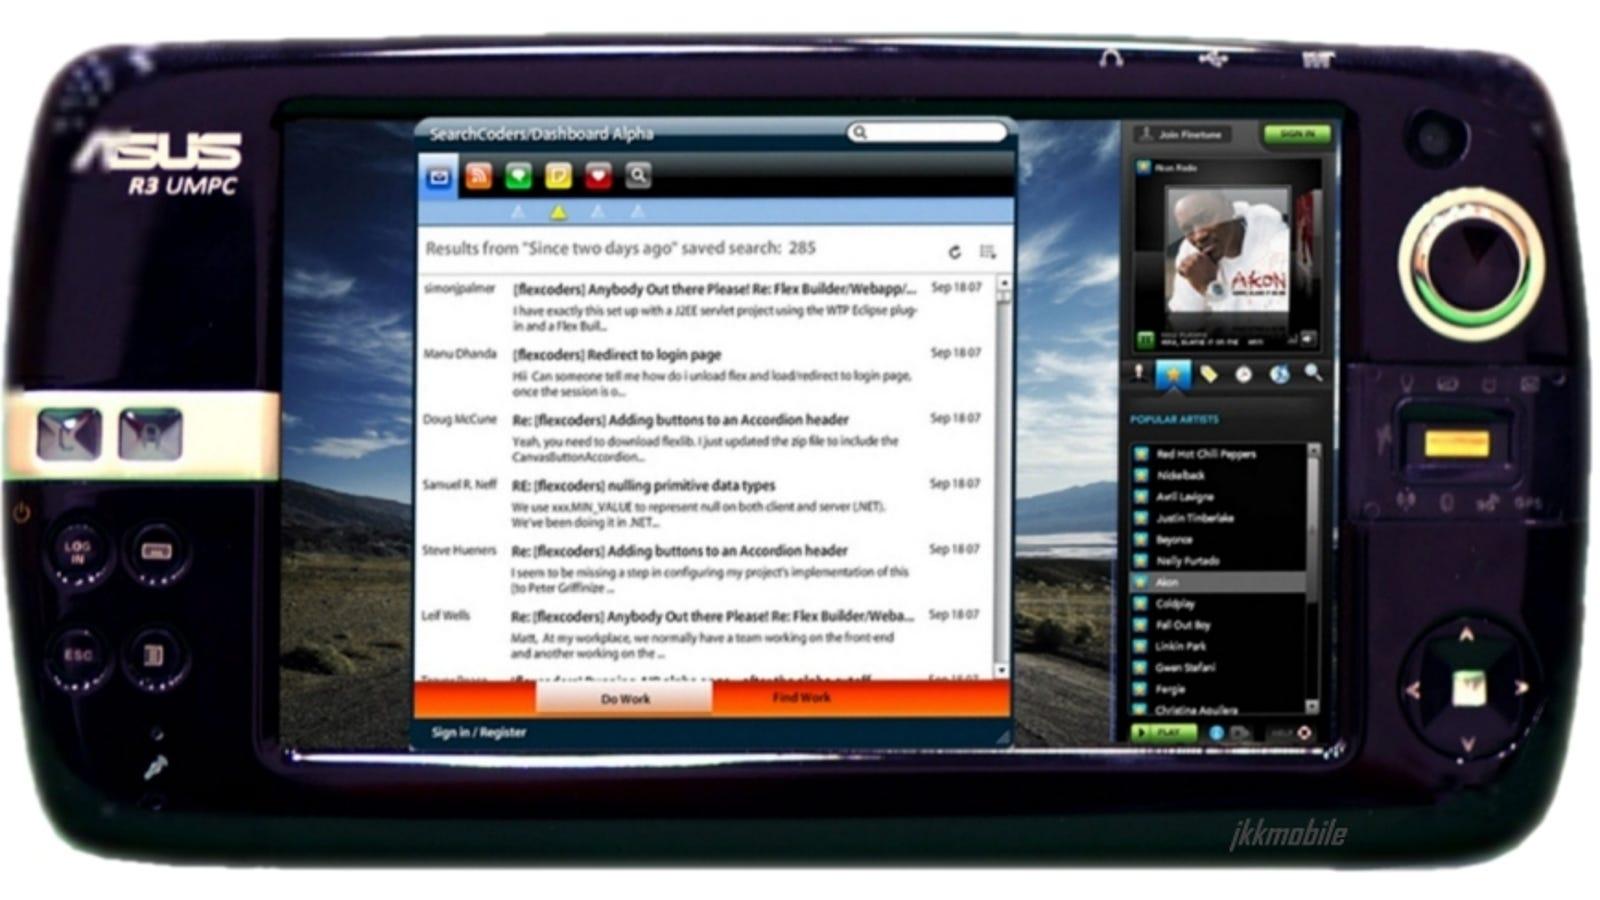 ASUS R50A UMPC ATKOSD2 DRIVERS FOR WINDOWS 8